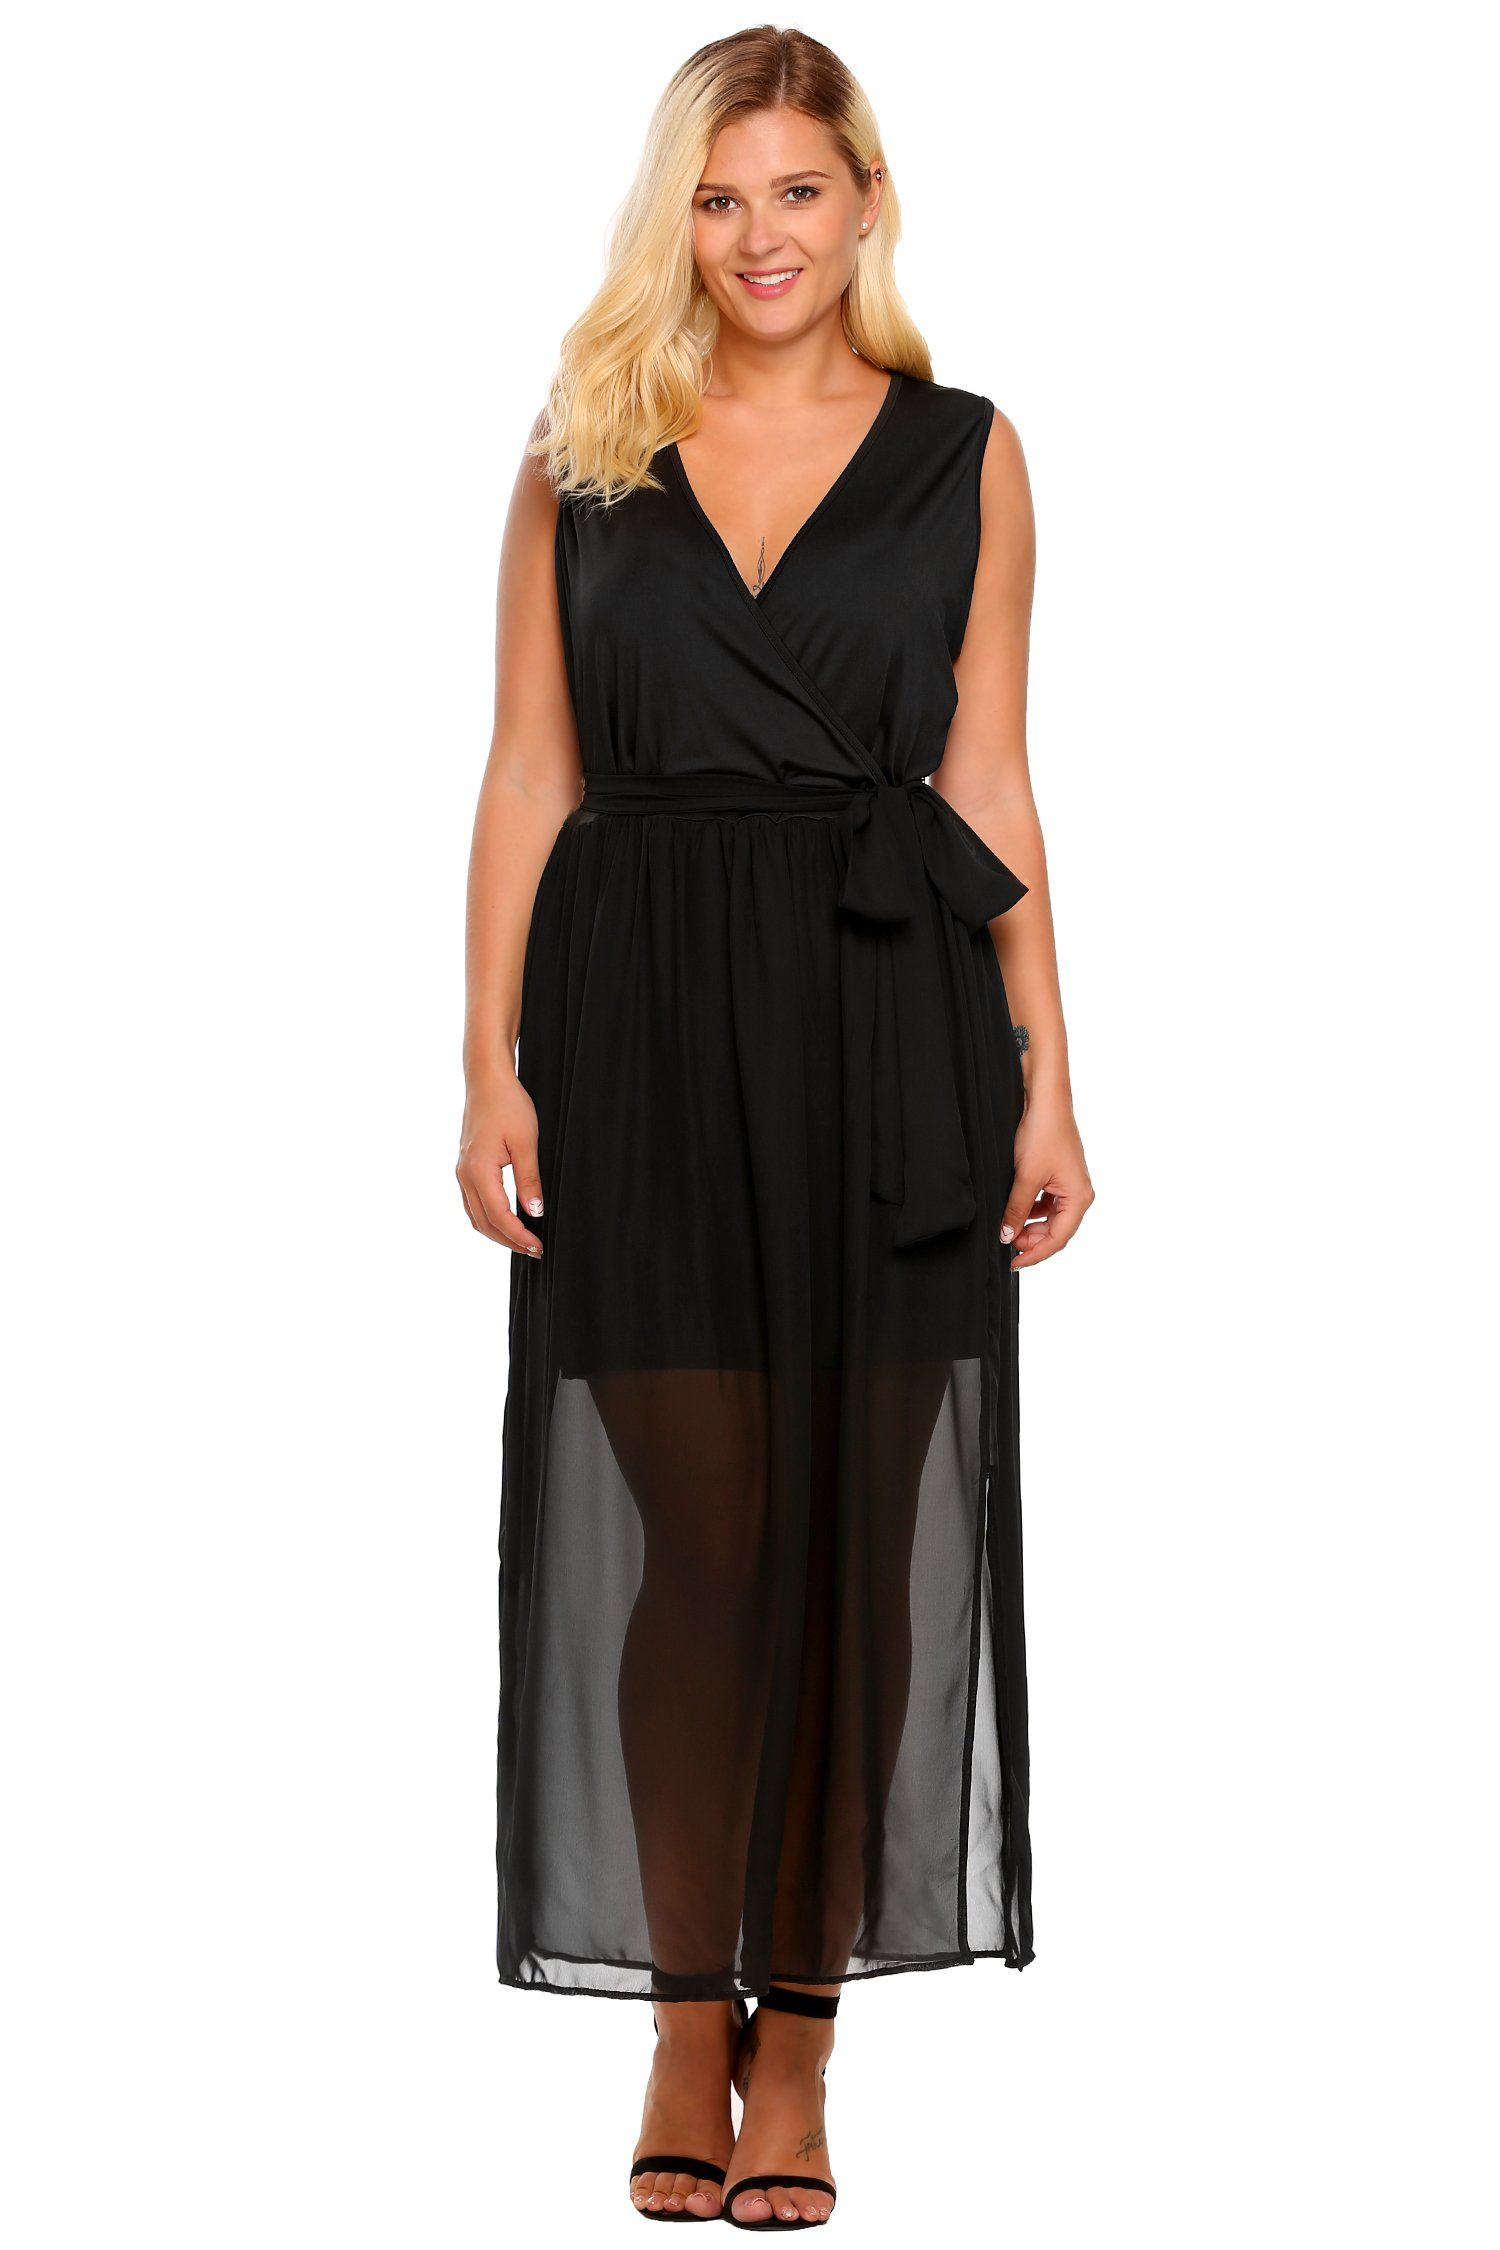 Womens Plus Size V Neck Split Chiffon Party Wedding Maxi Dress With Belt Black 5x Click Photo For More Details T Dresses Asymmetrical Dress Midi Maxi Dress [ 2250 x 1500 Pixel ]